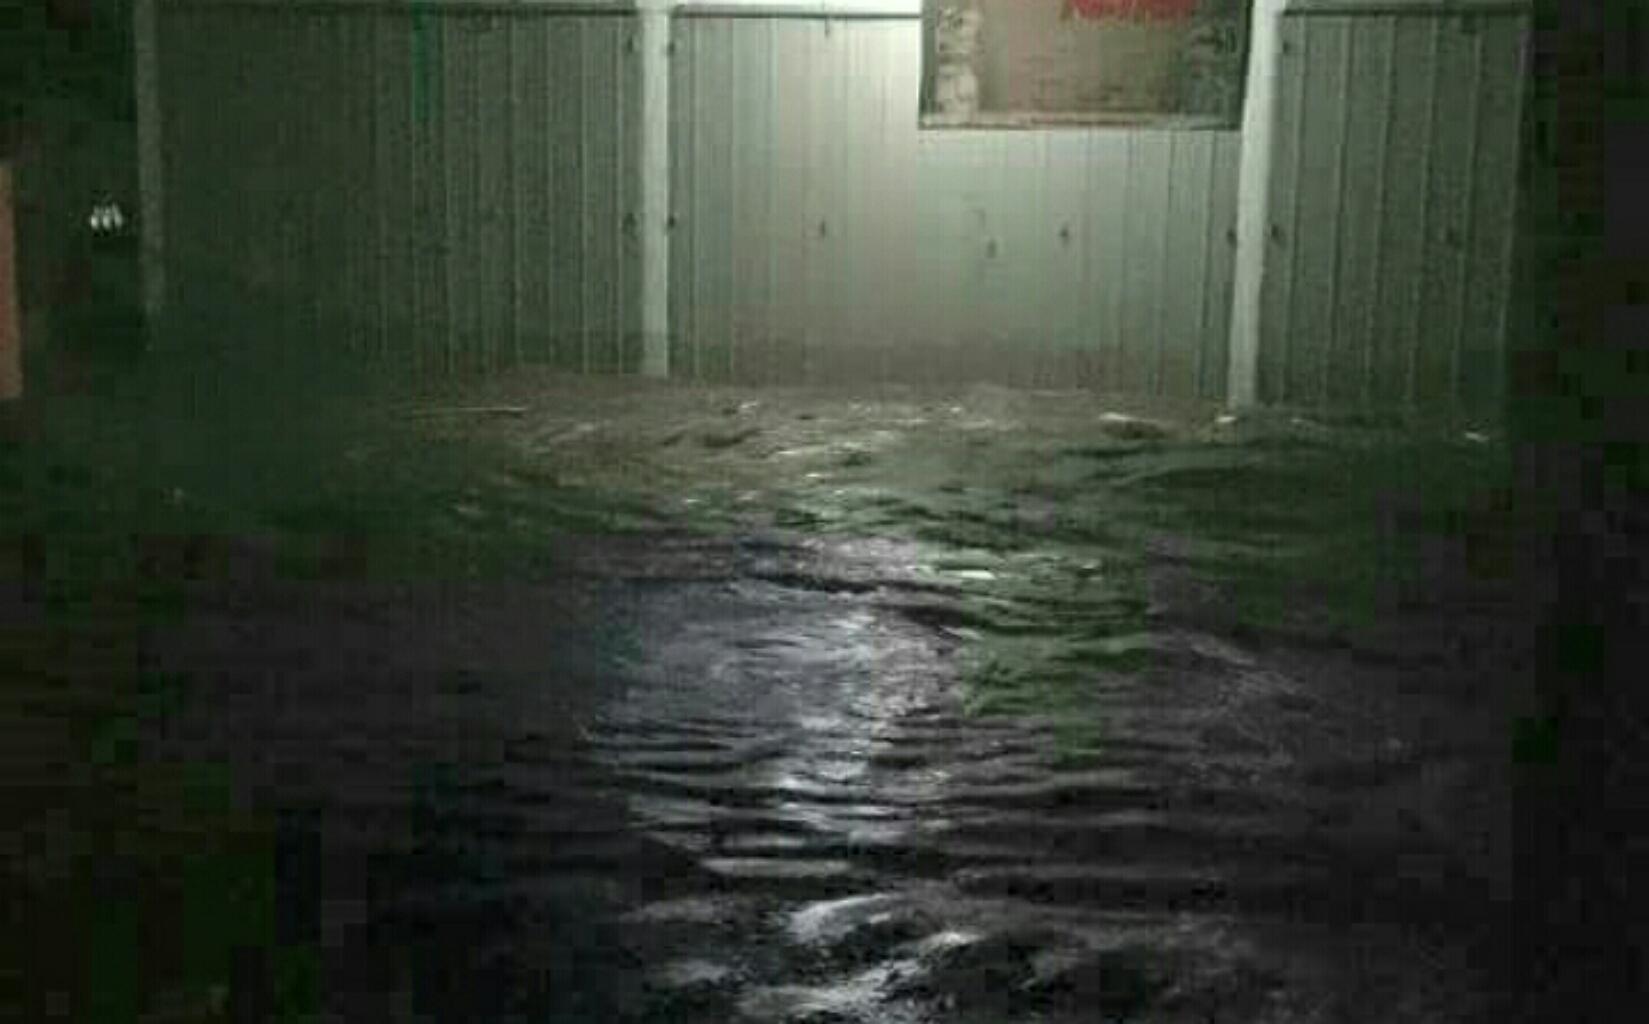 Garut Kembali Di Terjang Banjir, Netizen Sing Tabah , Sing Waspada